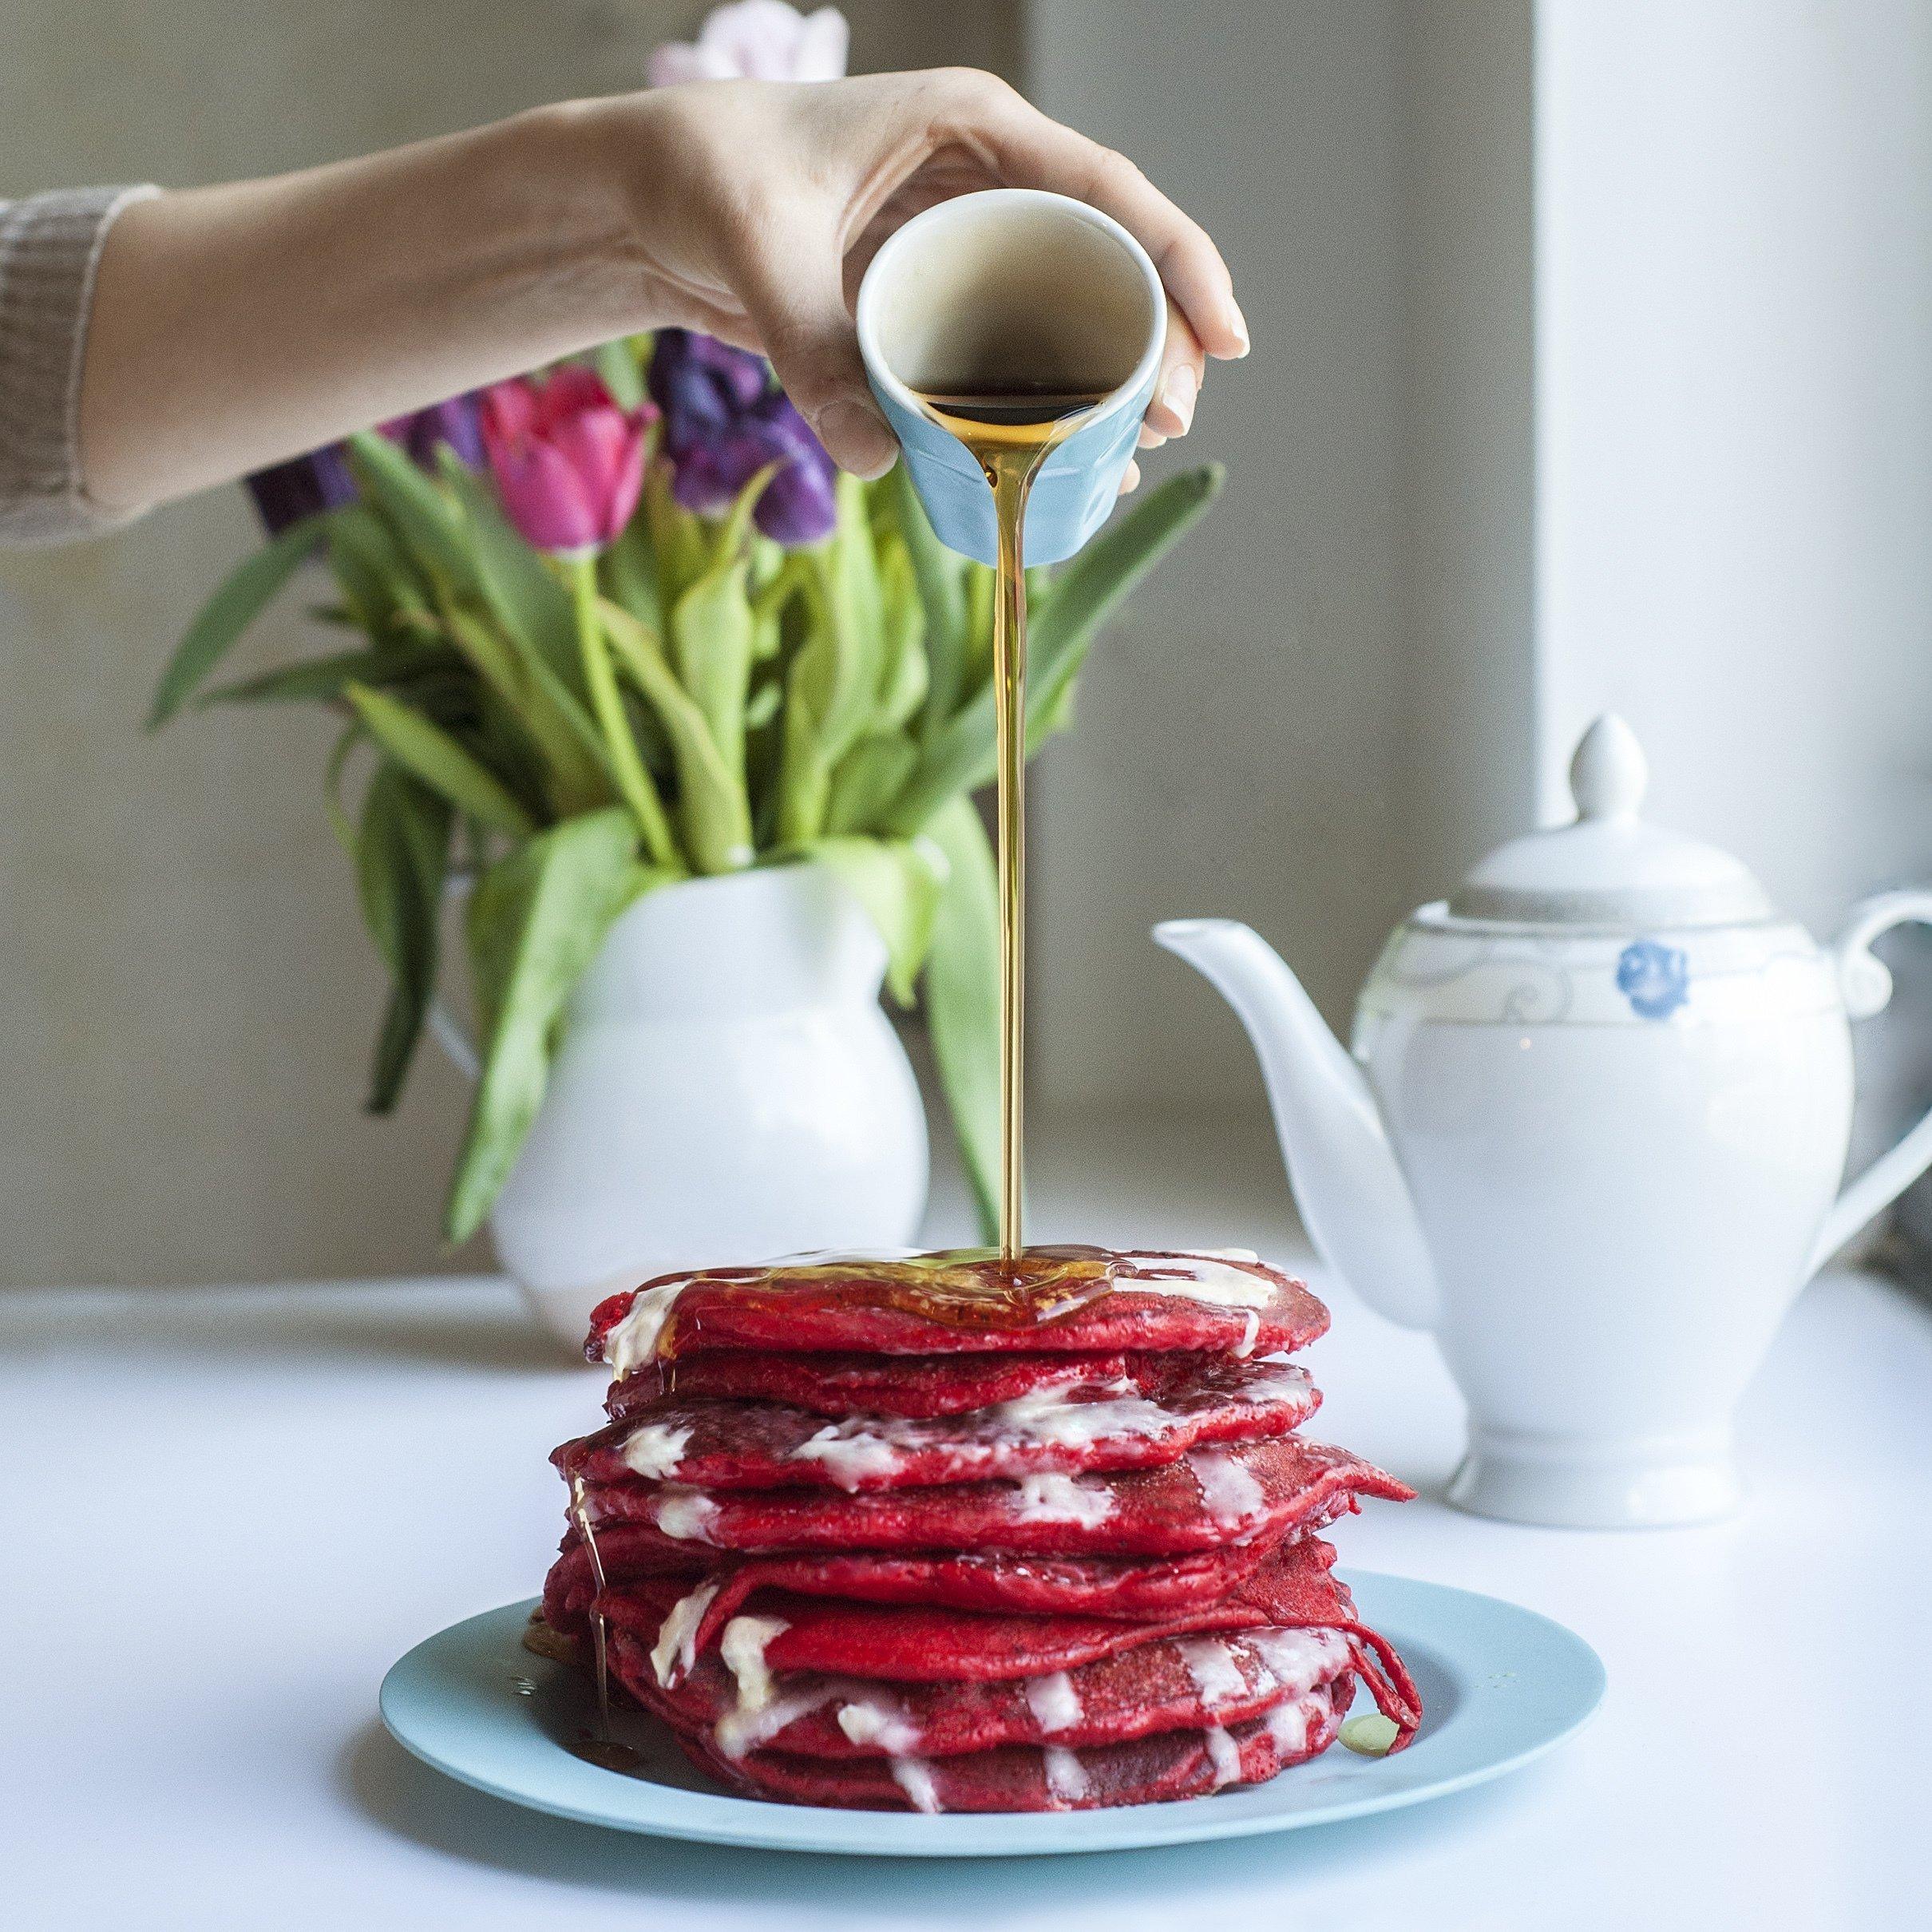 Autism Hope Alliance's Red Velvet Pancakes